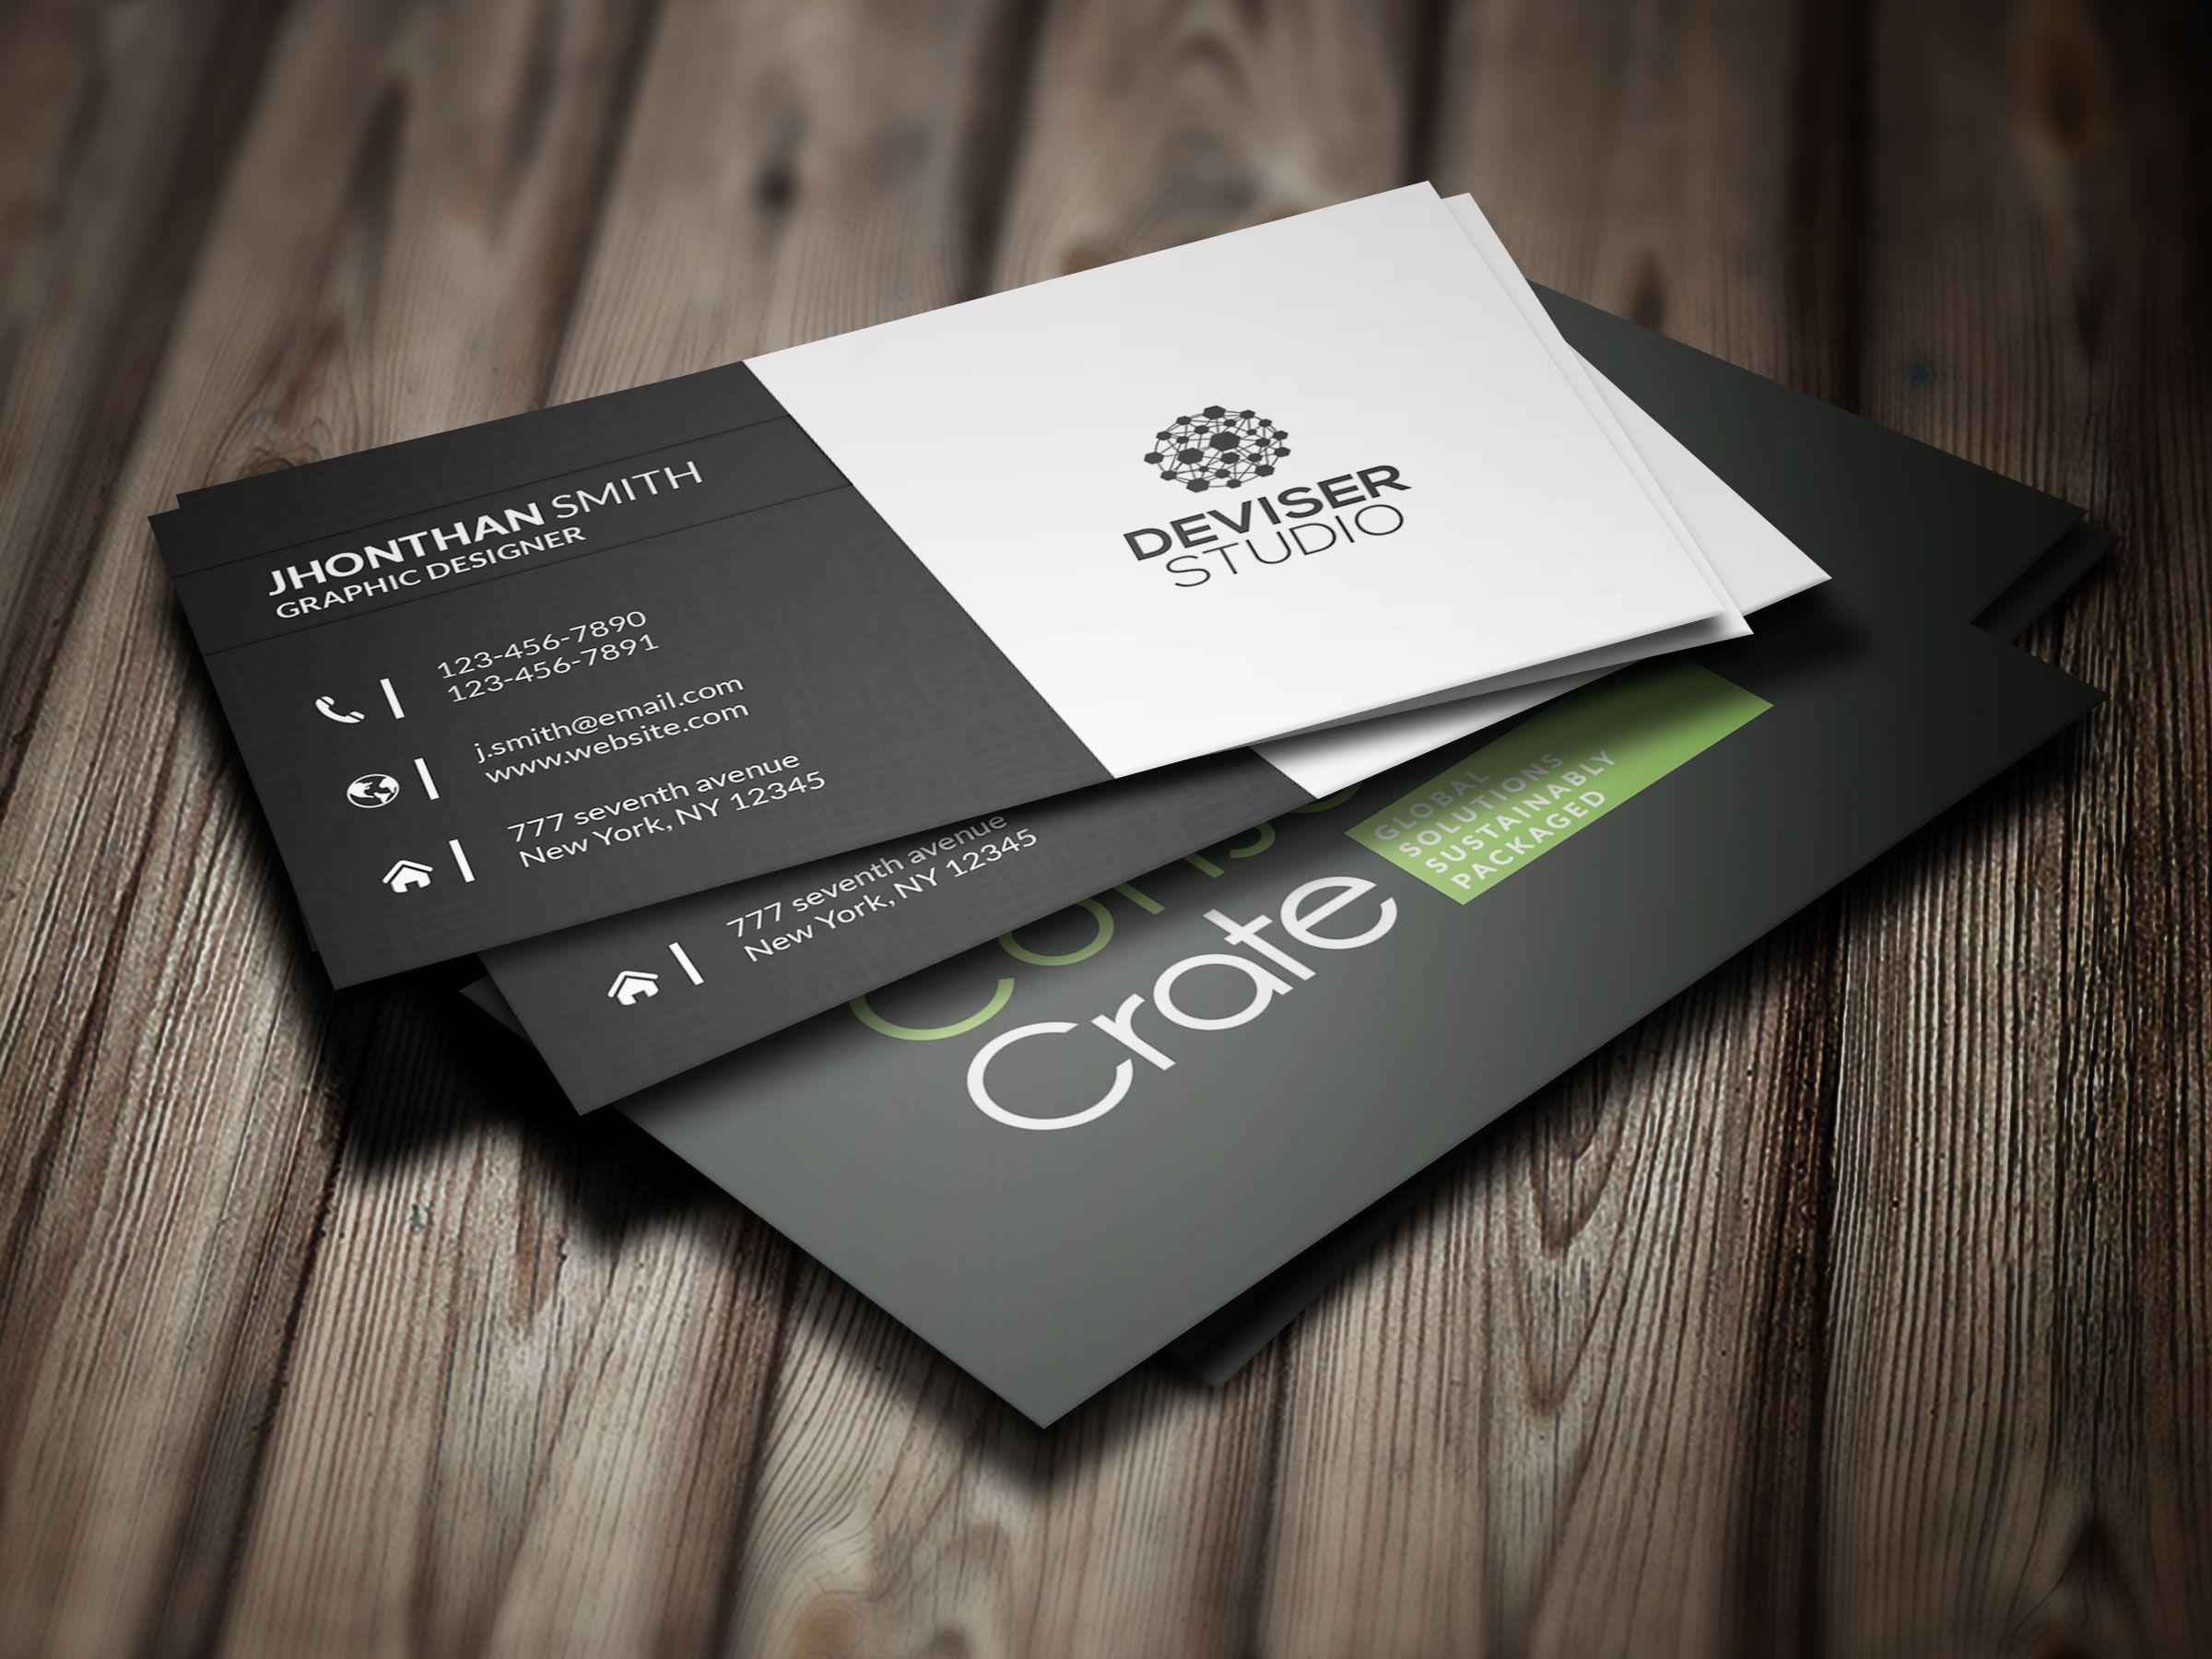 blank business card design mockup psd file free download - HD1920×1440